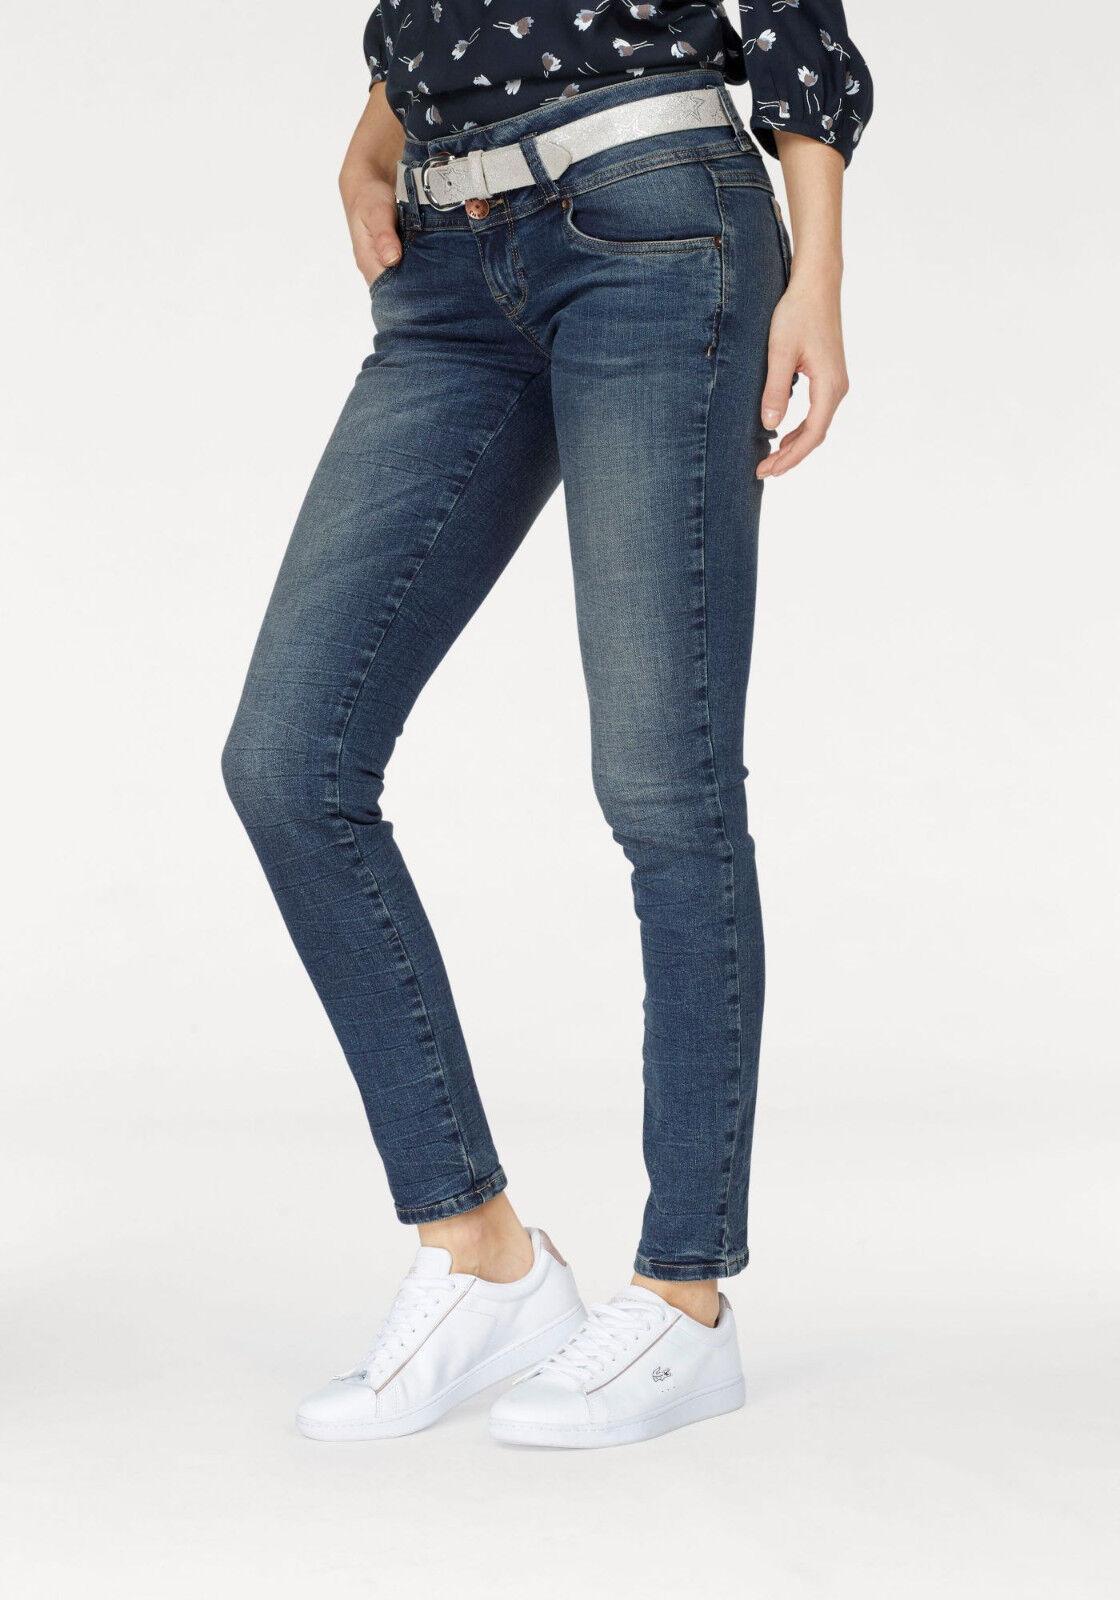 fc51409a93d Pulz Jeans Stretch-Jeans »Anett«. medium blue. NEU!!! KP 99,95 ...